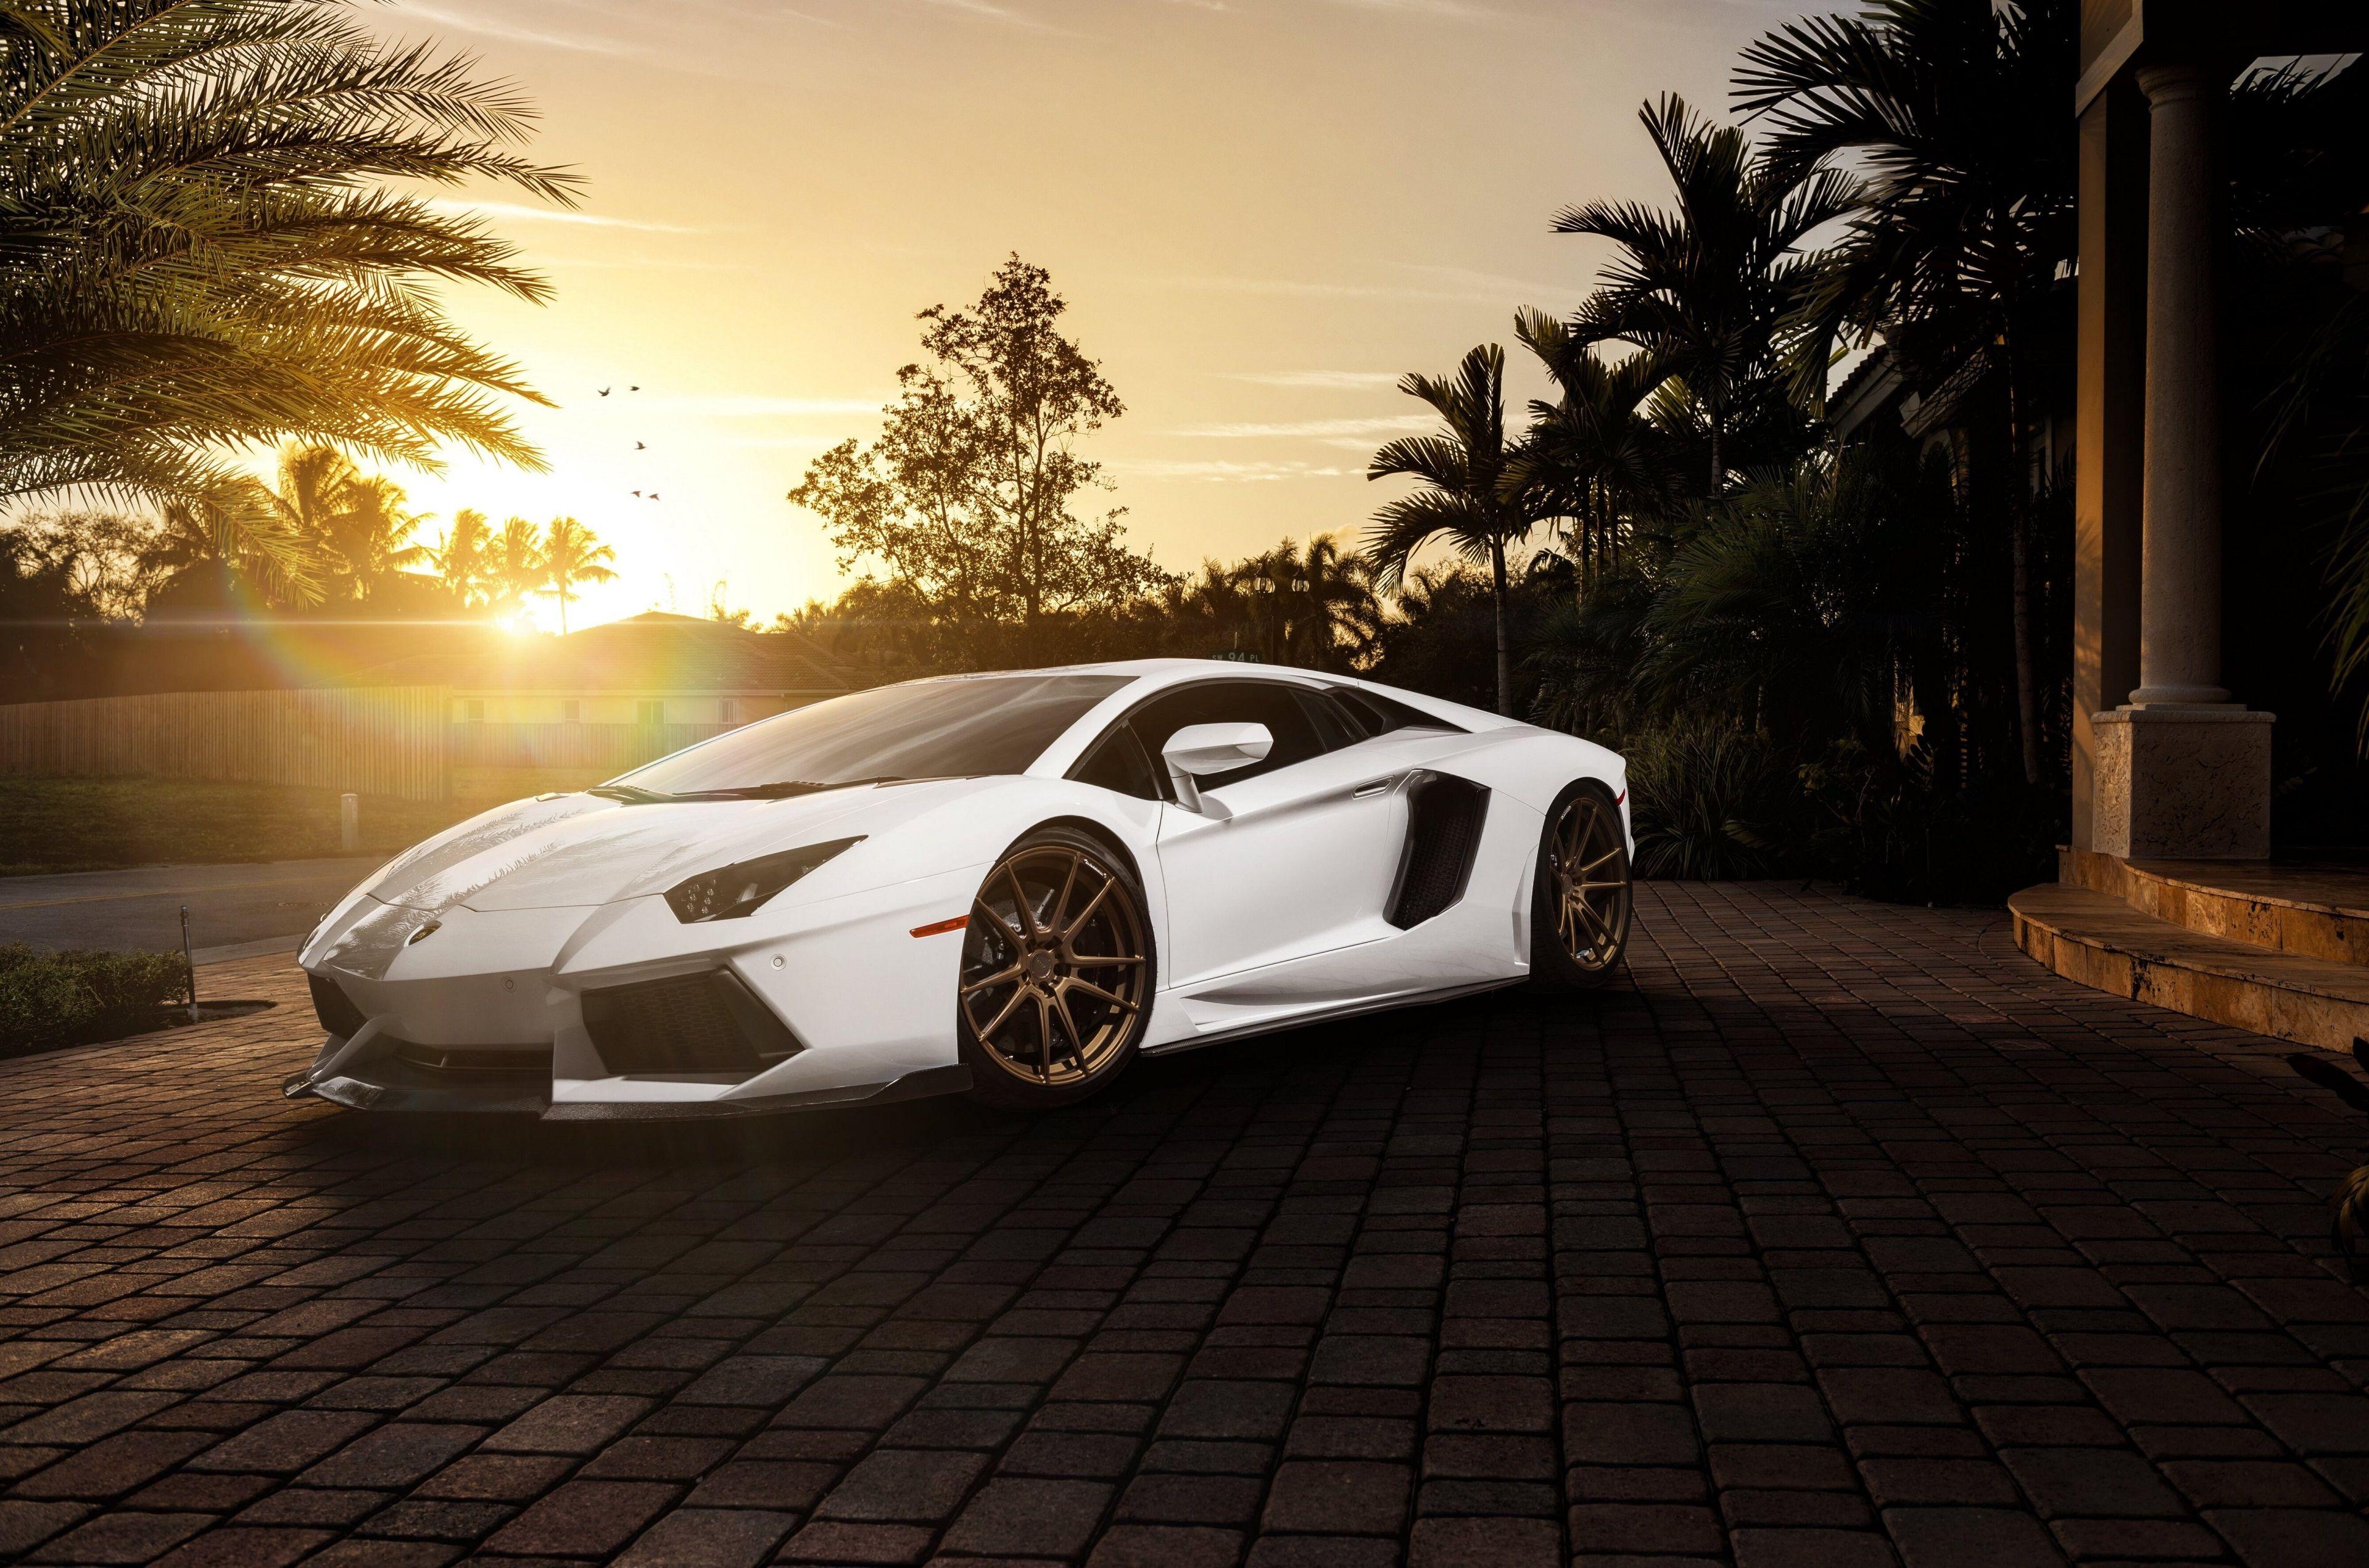 3840x2542 Lamborghini Aventador 4k Backgrounds Free Download